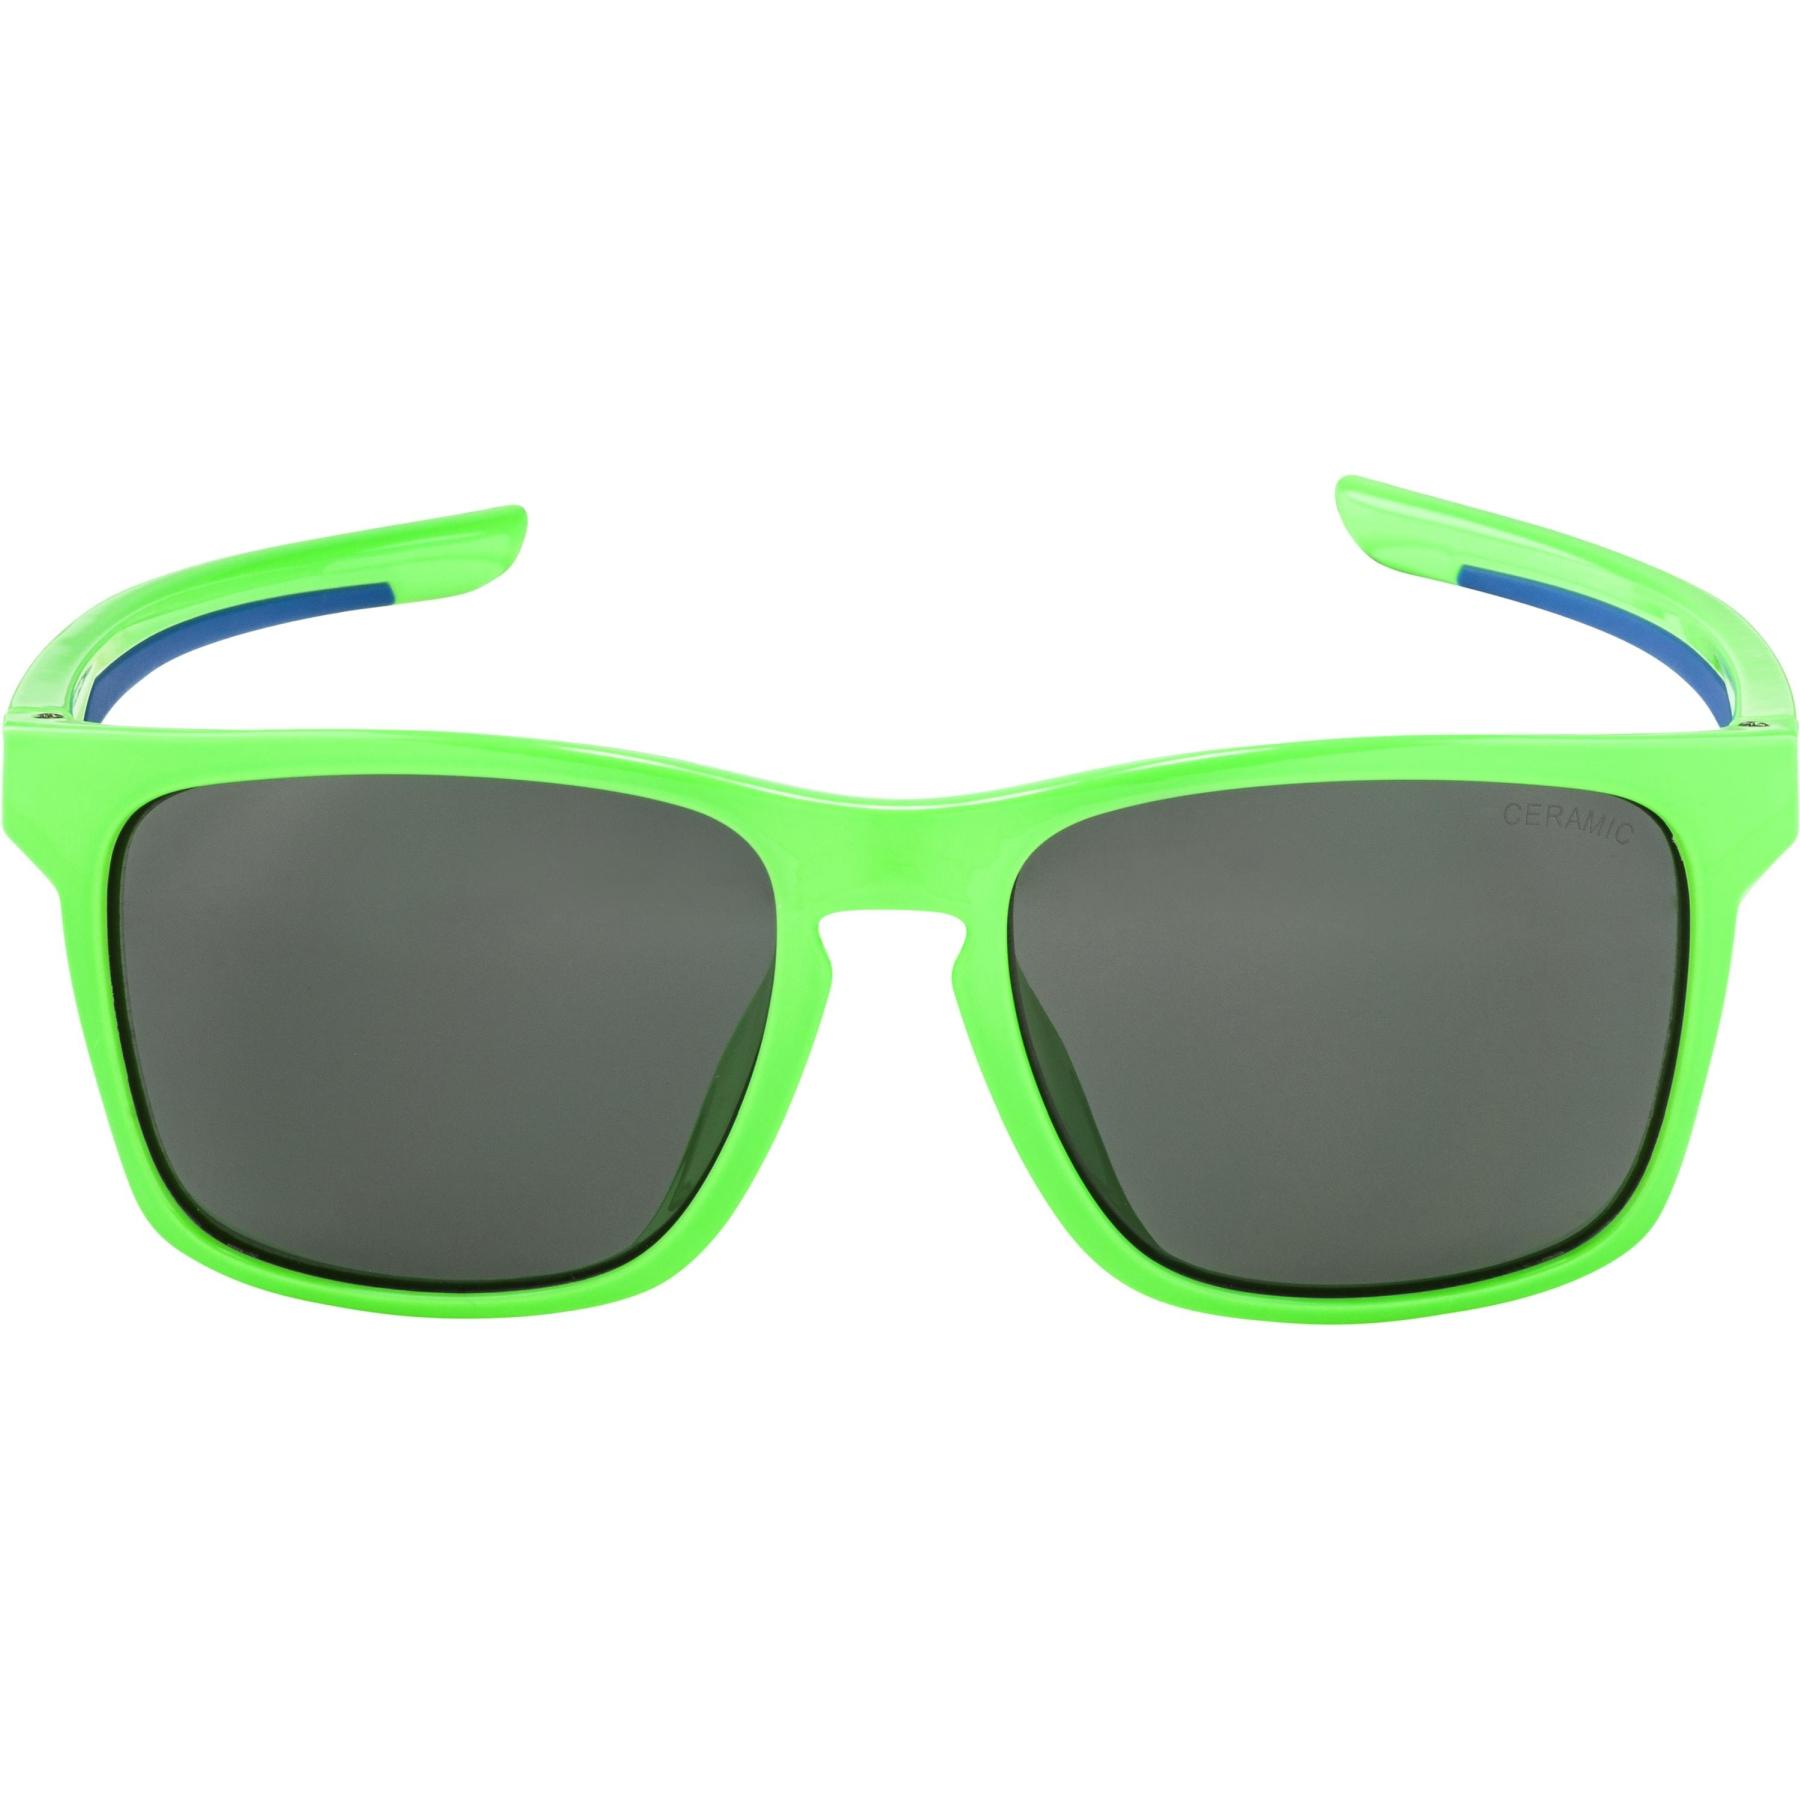 Image of Alpina Flexxy Cool Kids I Glasses - neon green-blue / black